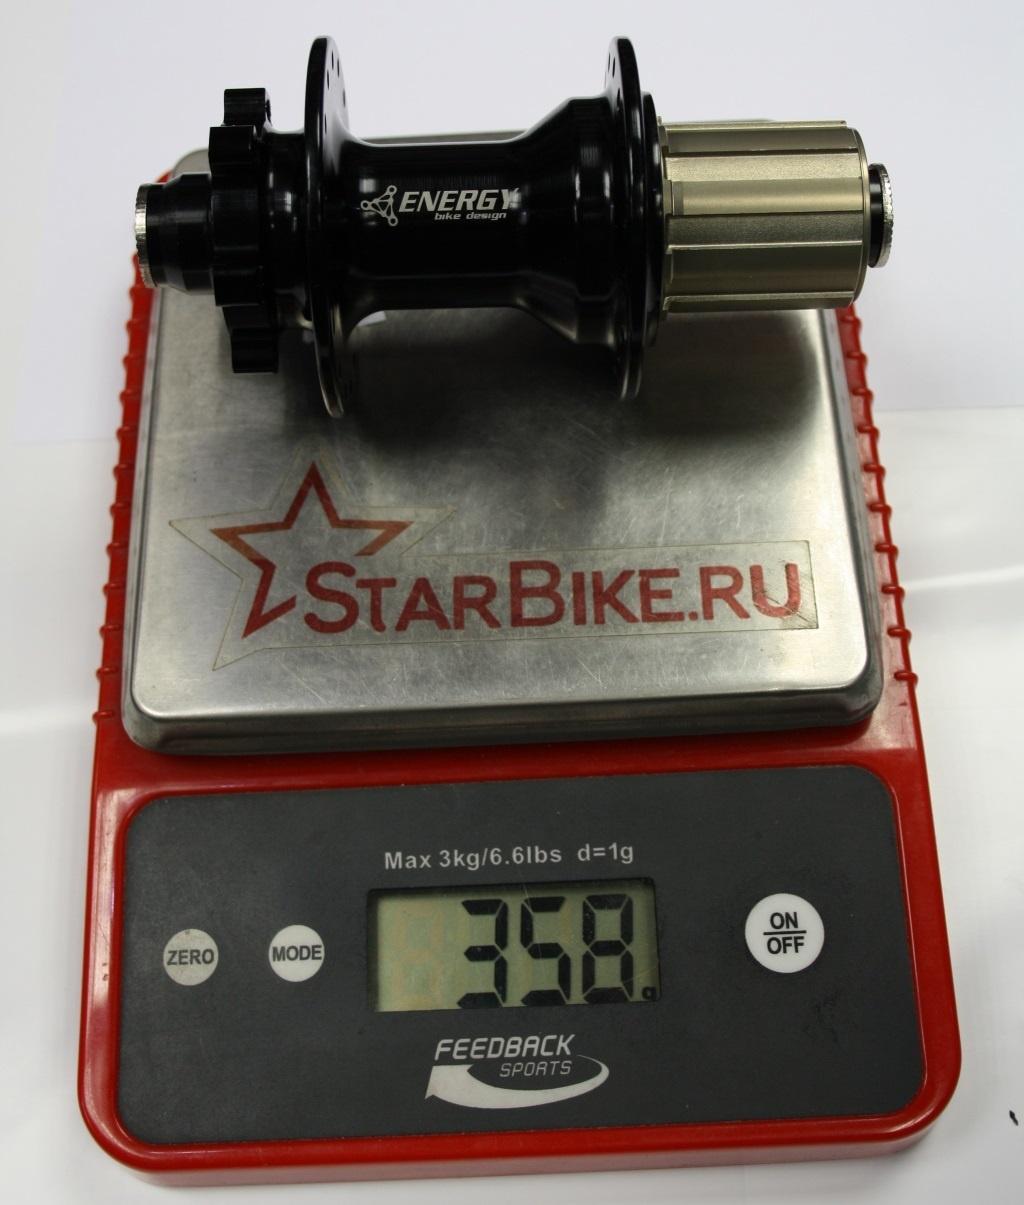 Магазин StarBike: Energy - в колесном тренде!